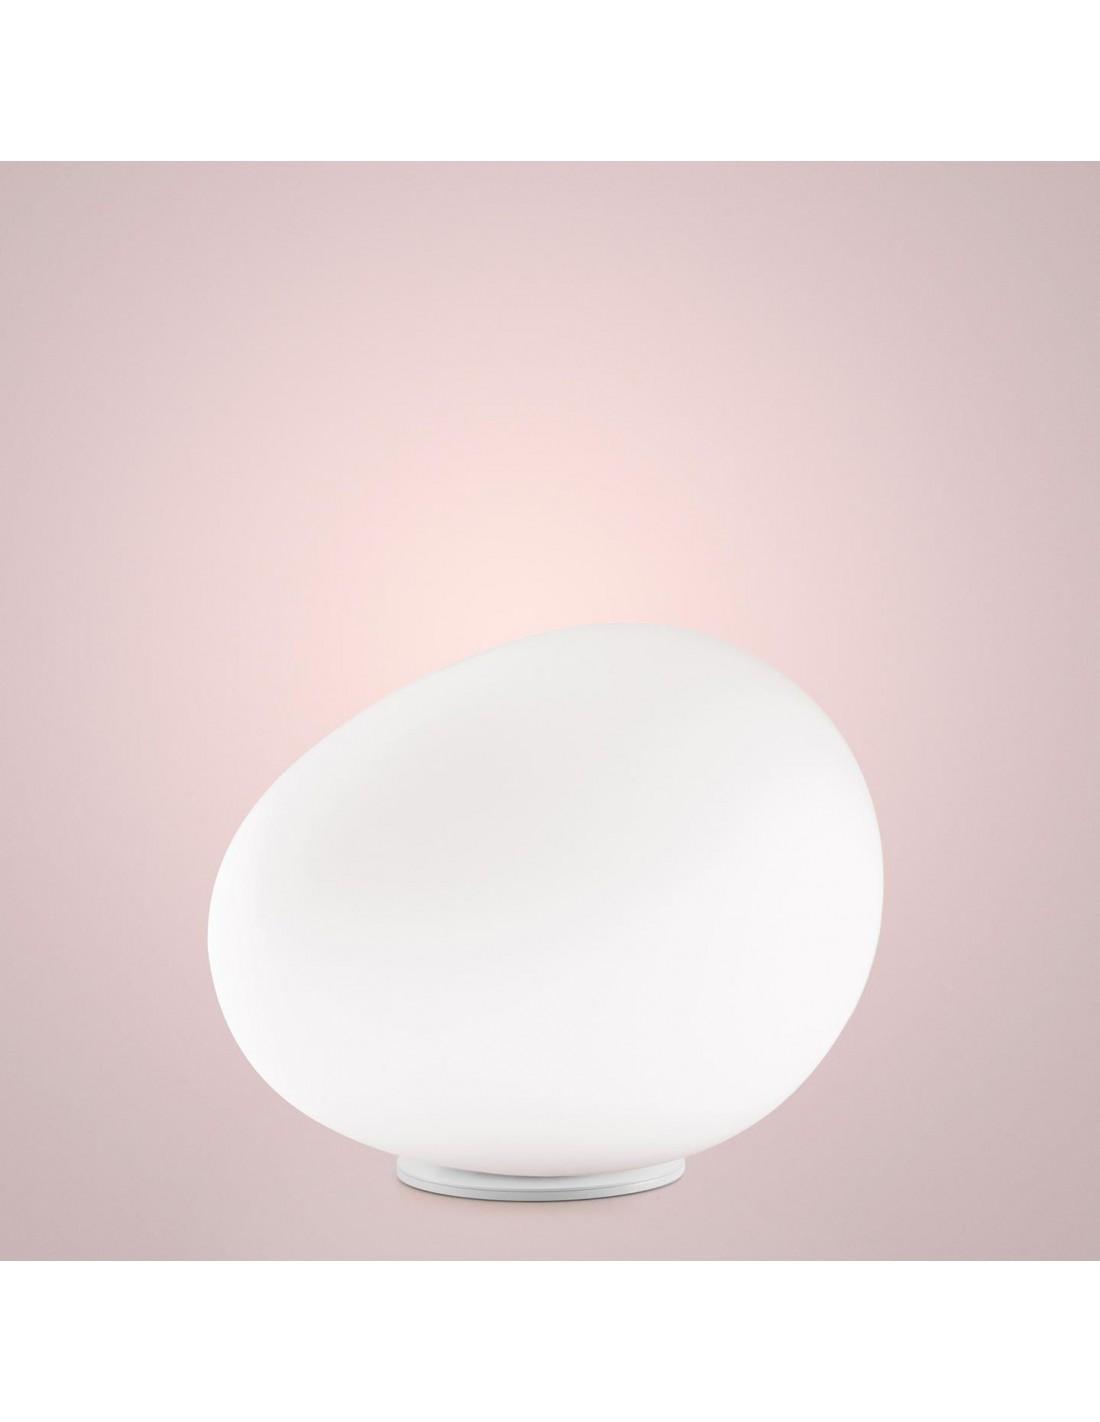 Lampe de table Gregg avec base blanche pour la marque Foscarini chez Valente Design